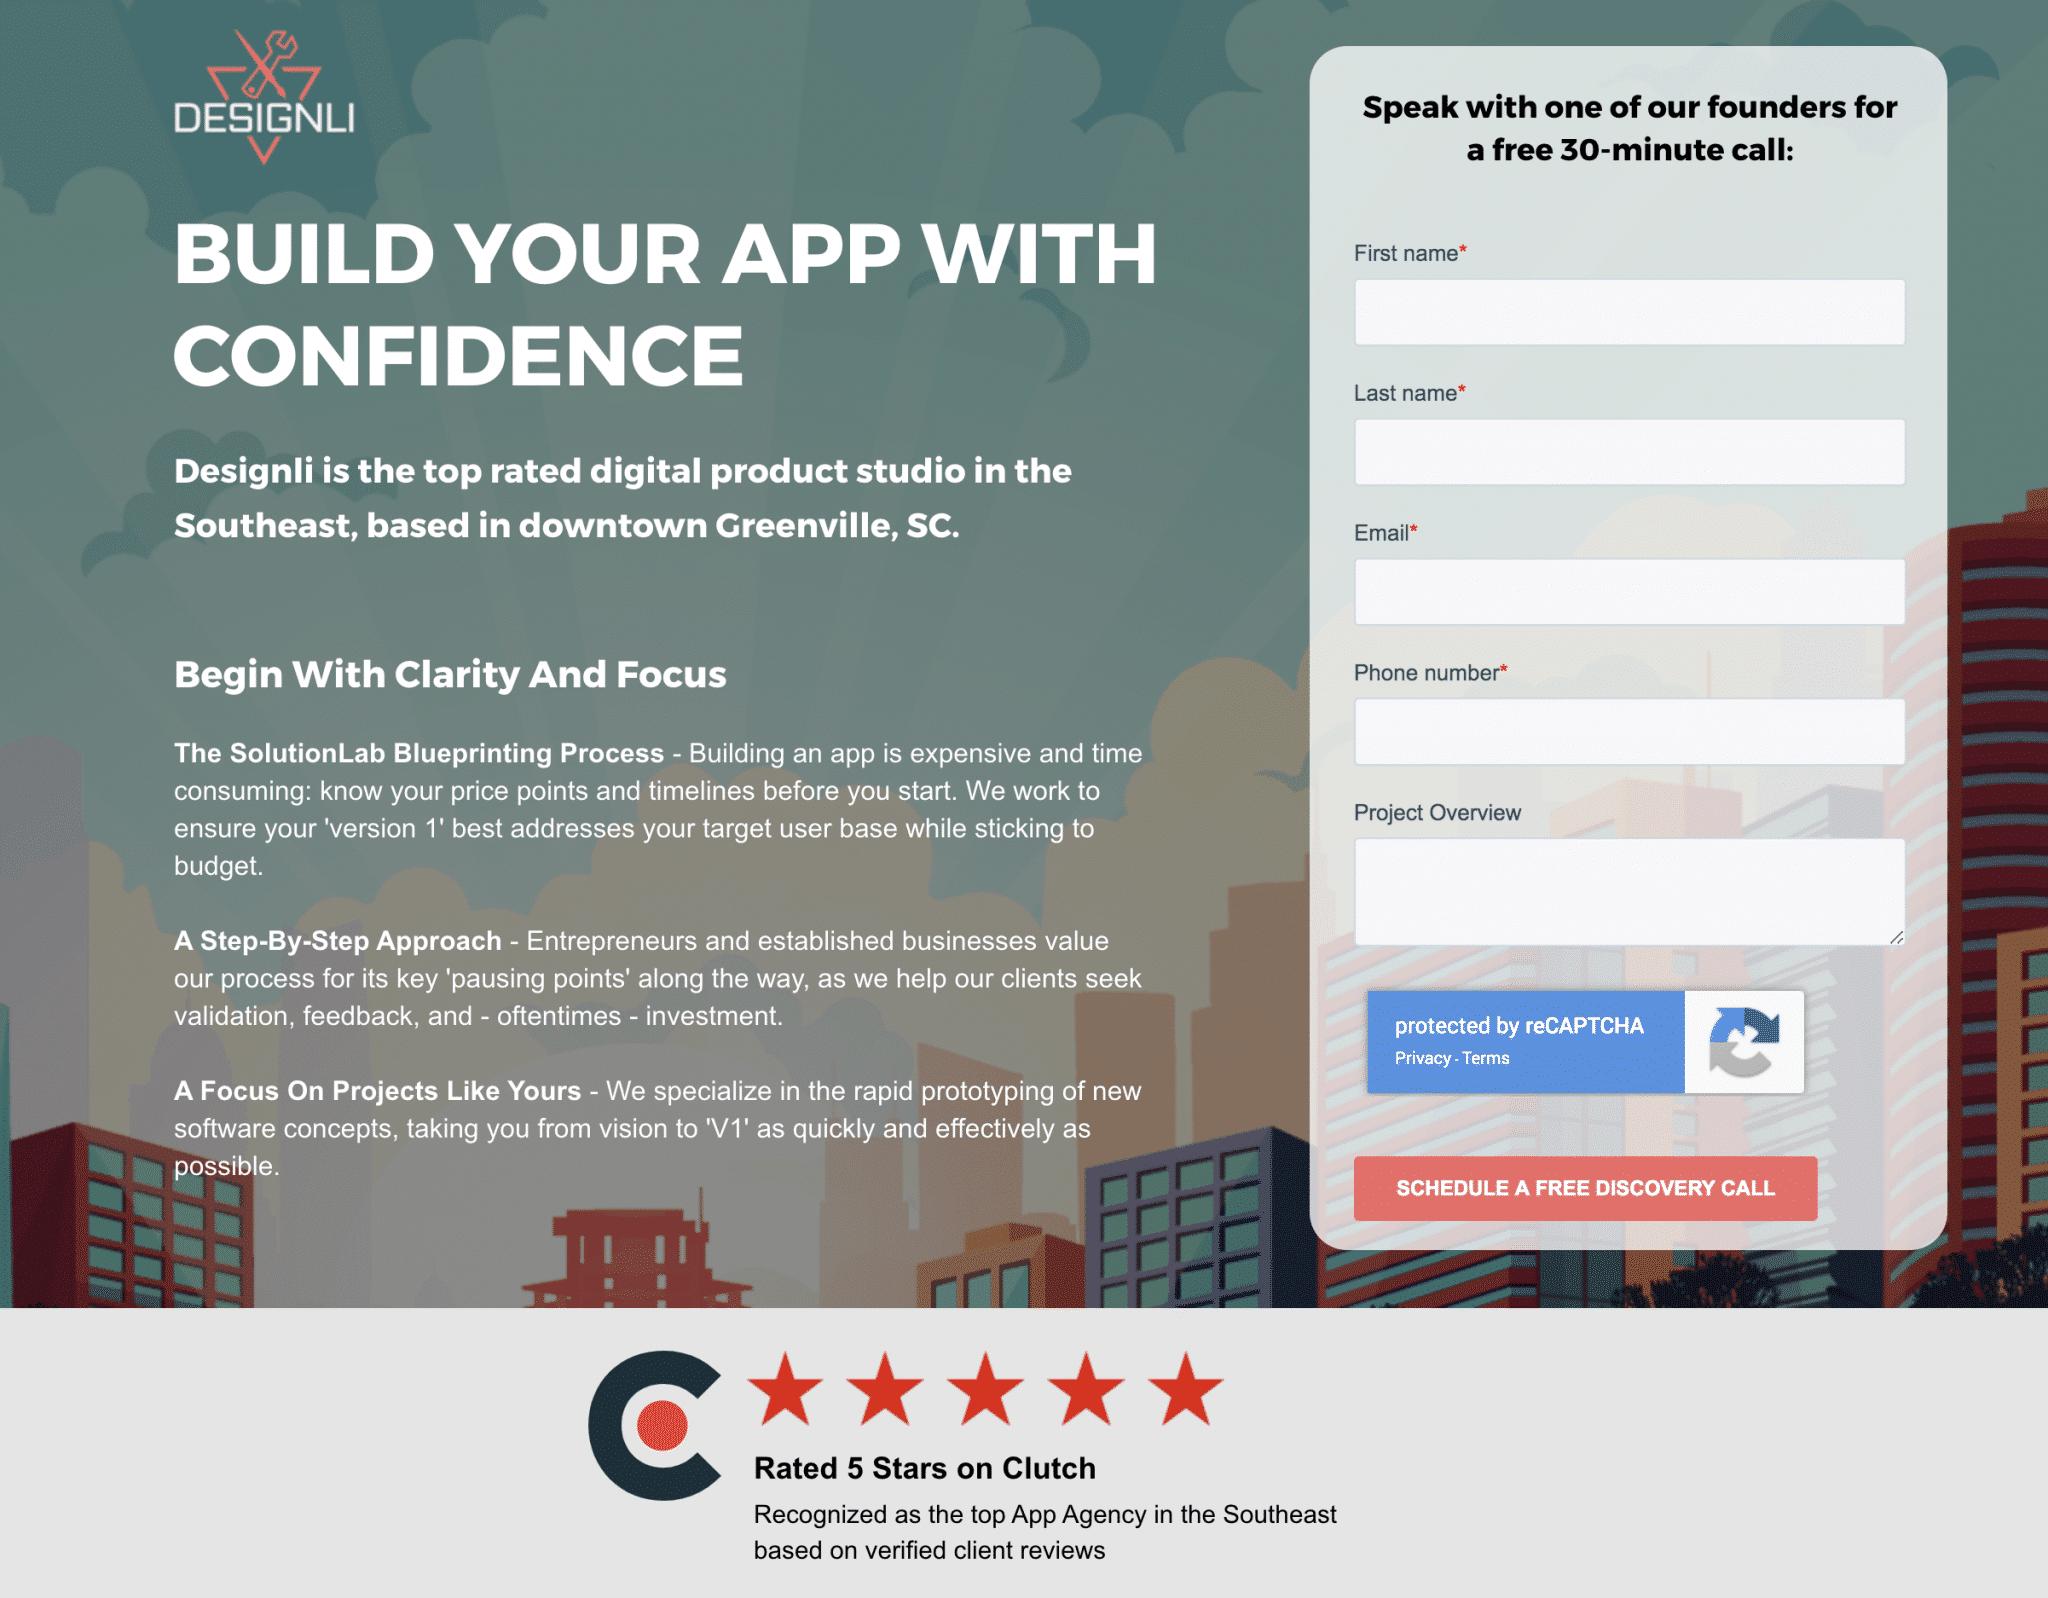 designil email capturing landing page